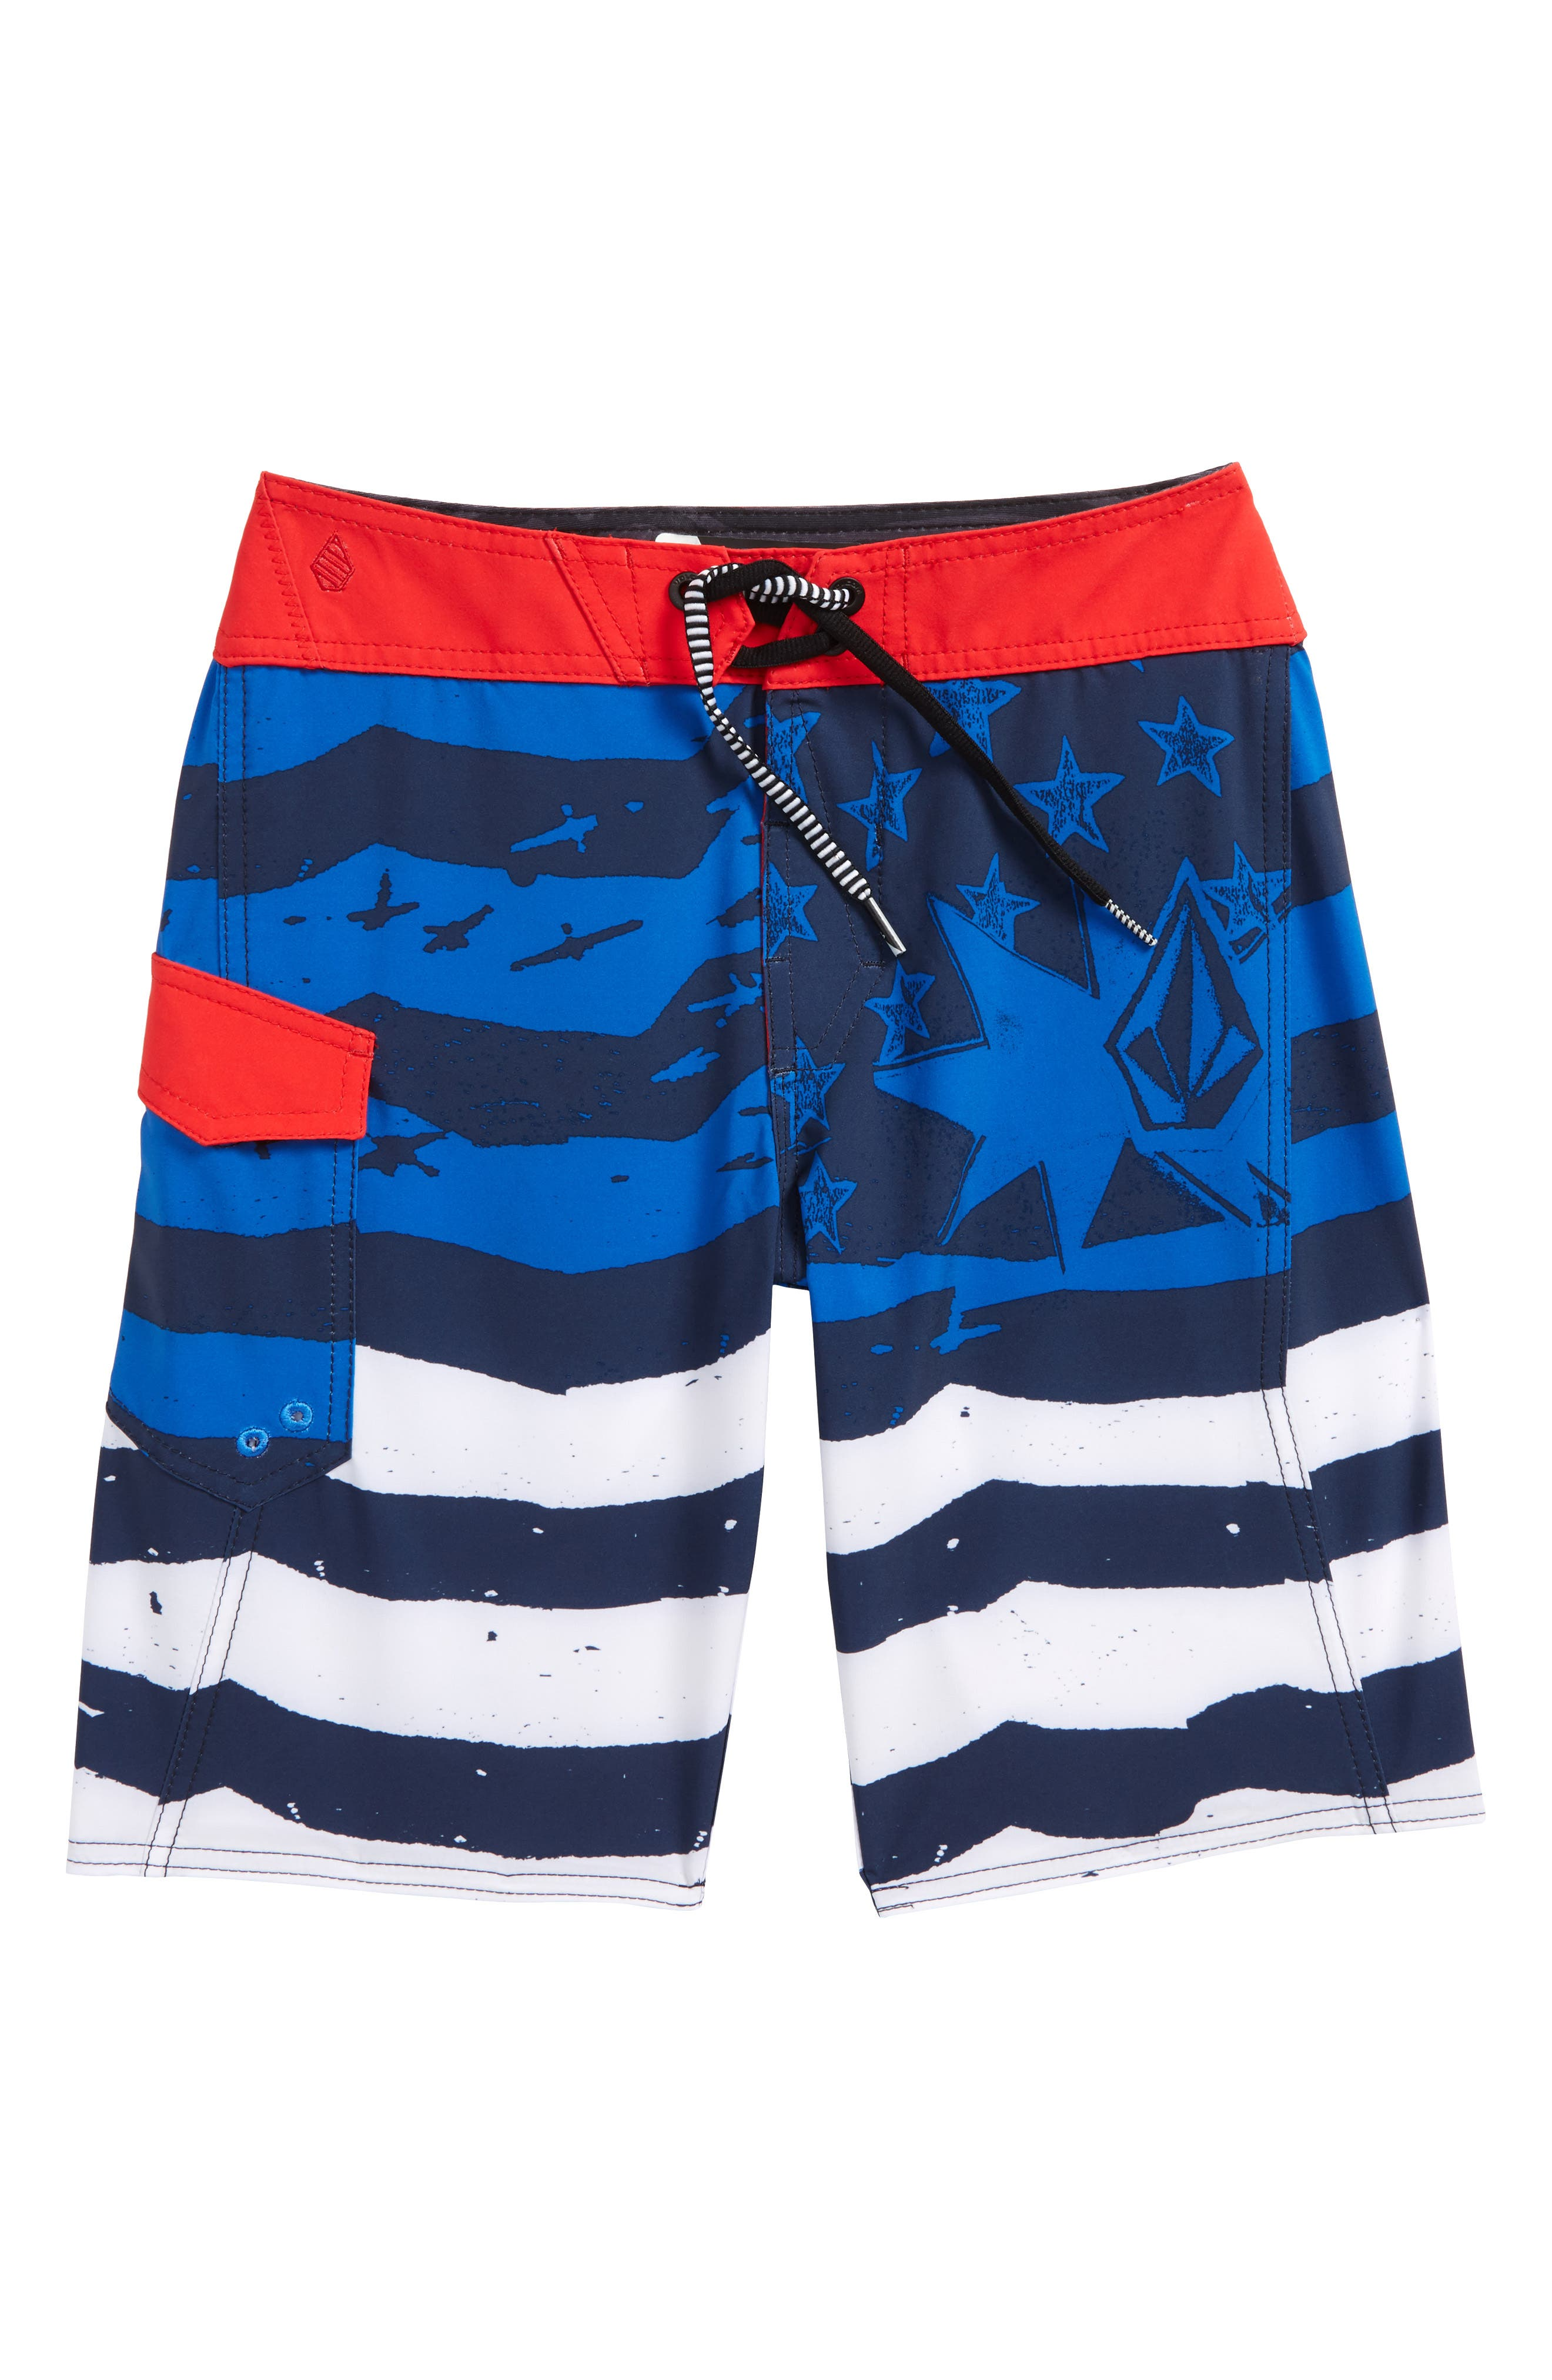 Alternate Image 1 Selected - Volcom Youth of July Mod Board Shorts (Big Boys)